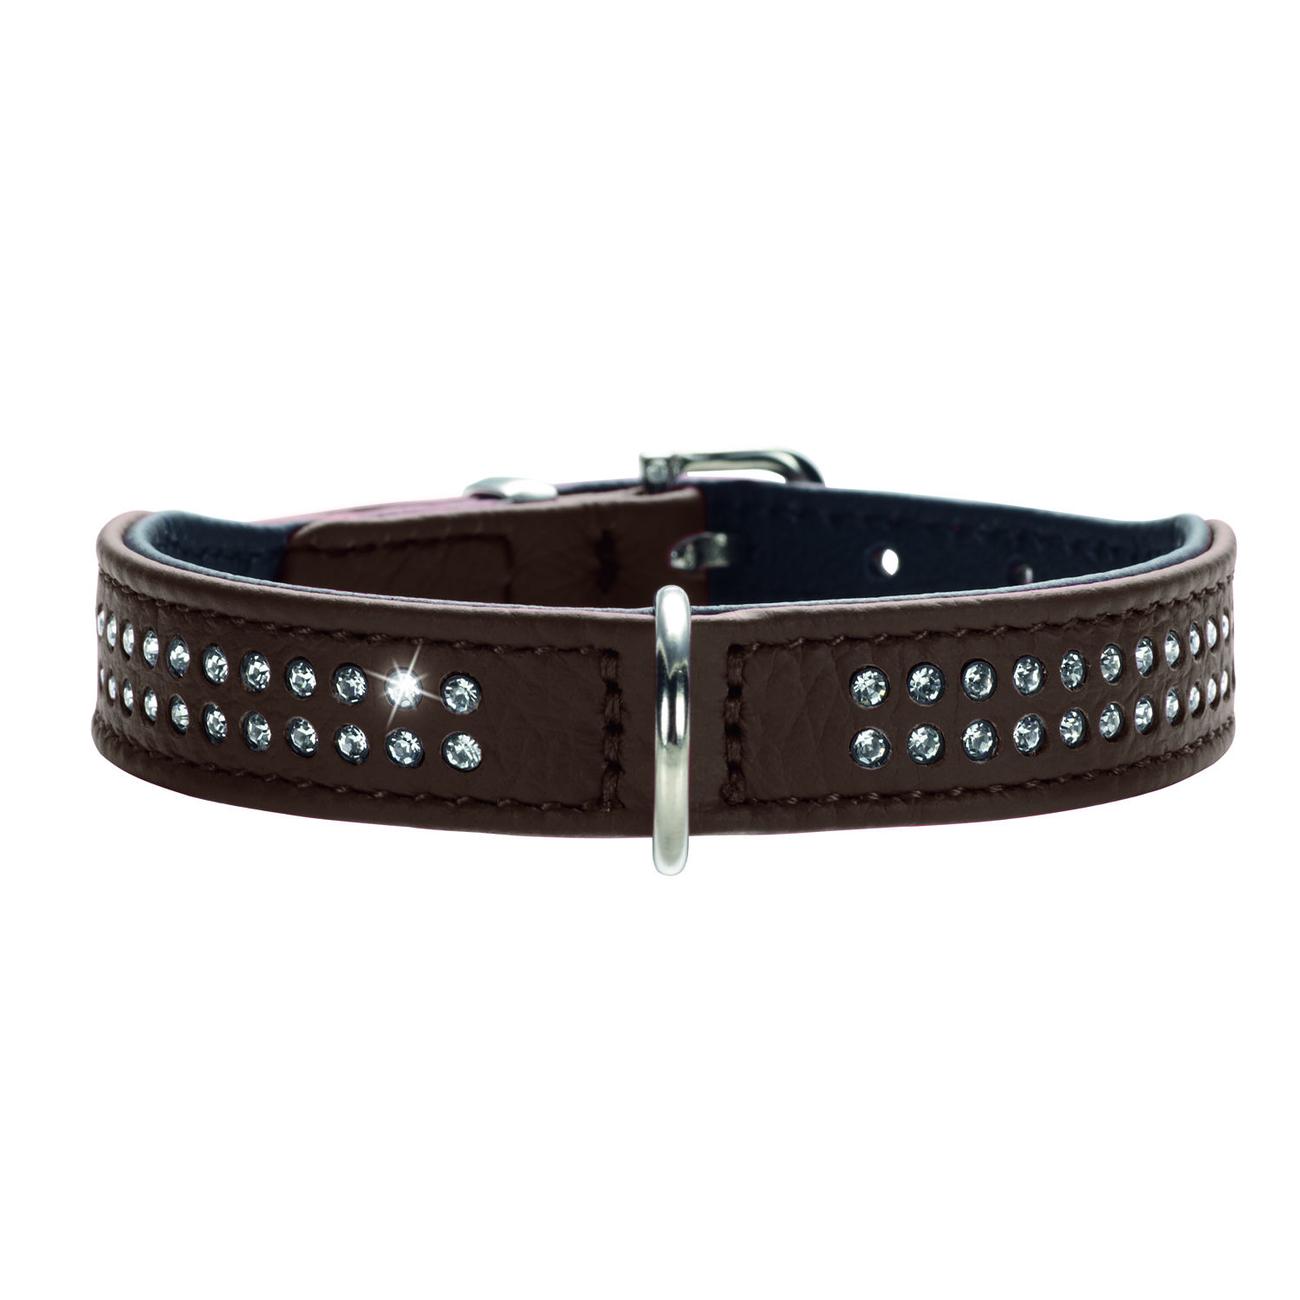 Hunter Halsband Swarowski Diamond Petit für kleine Hunde 47724, Bild 7